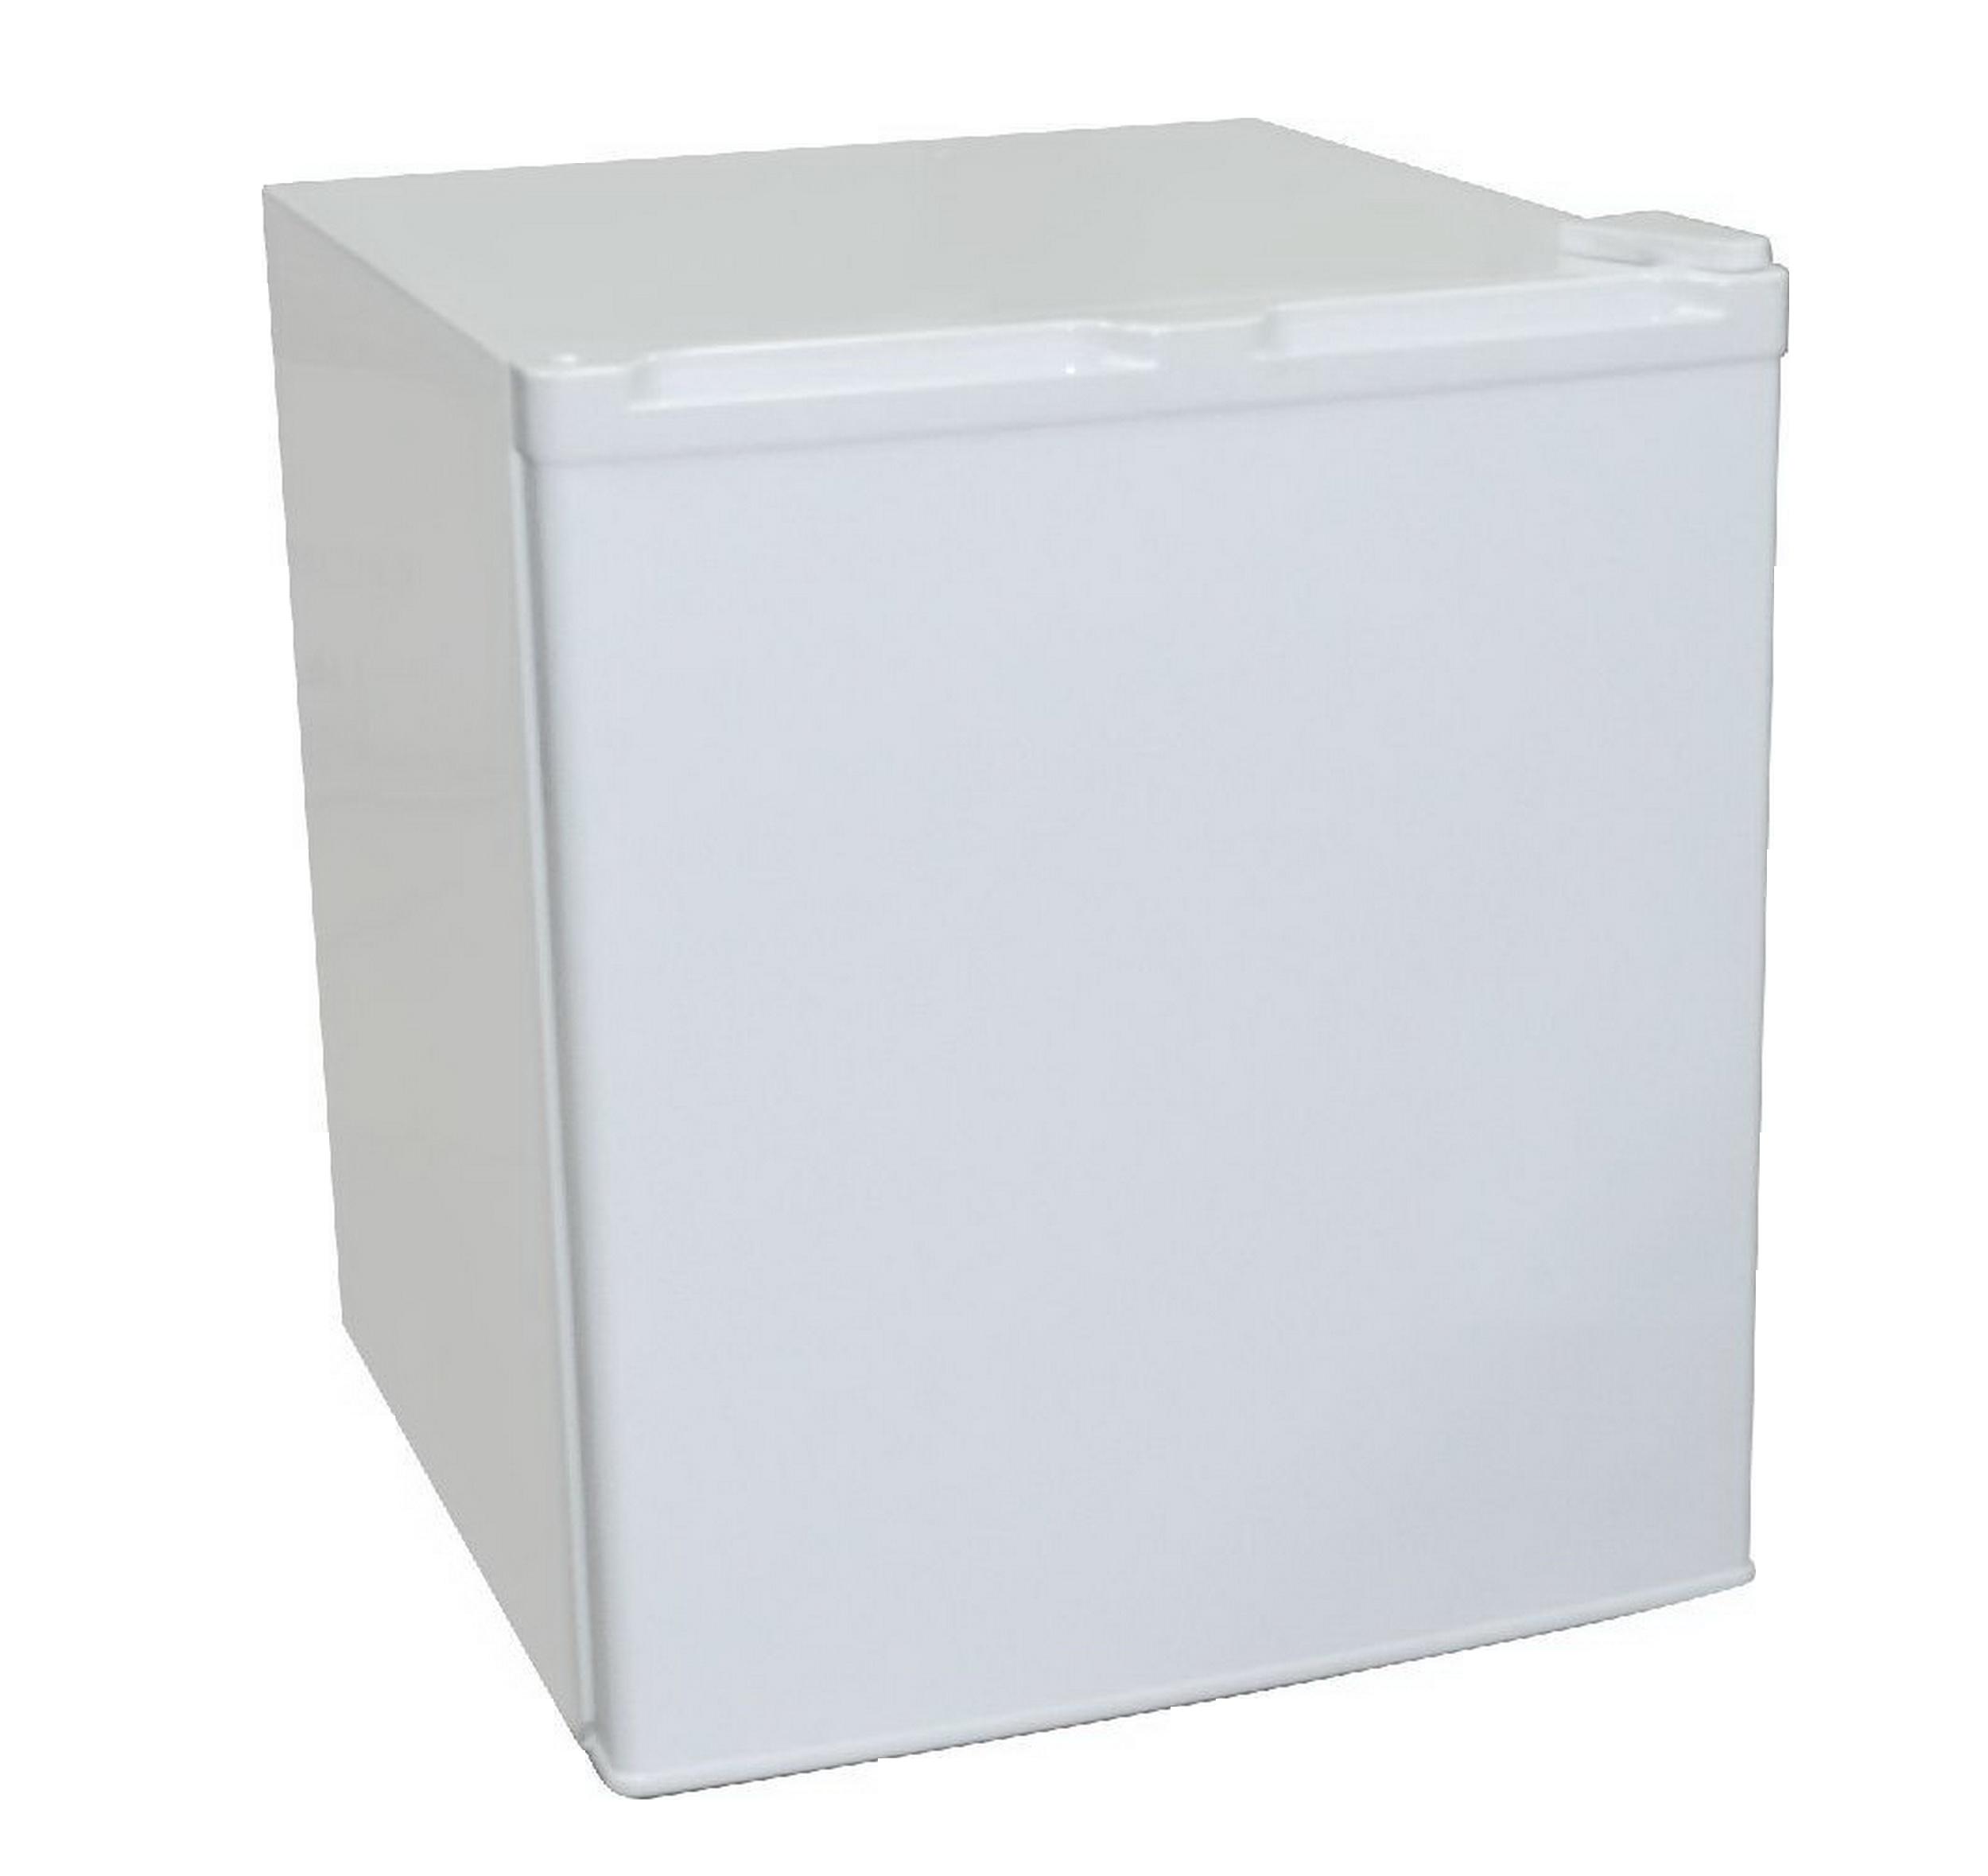 refrigerateur cube 189 euros jouets a prix discount. Black Bedroom Furniture Sets. Home Design Ideas